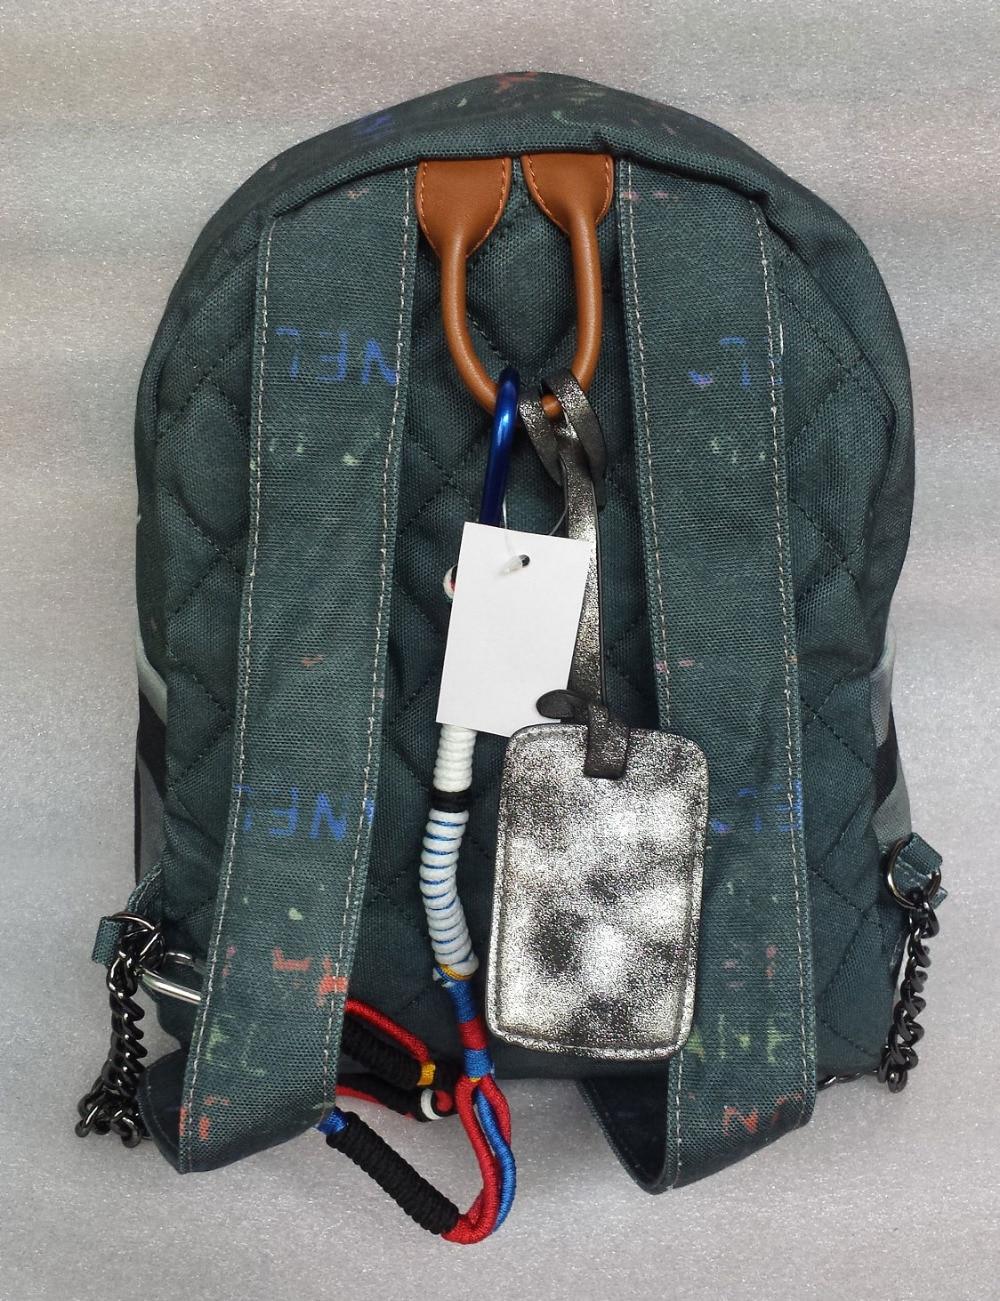 School bag new design - Aliexpress Com Buy High Quality Fashion Backpack Graffiti Travel Bag New Design Vintage Style Storage Schoolbag Shoulders Bag Youth Doodle Backpack From